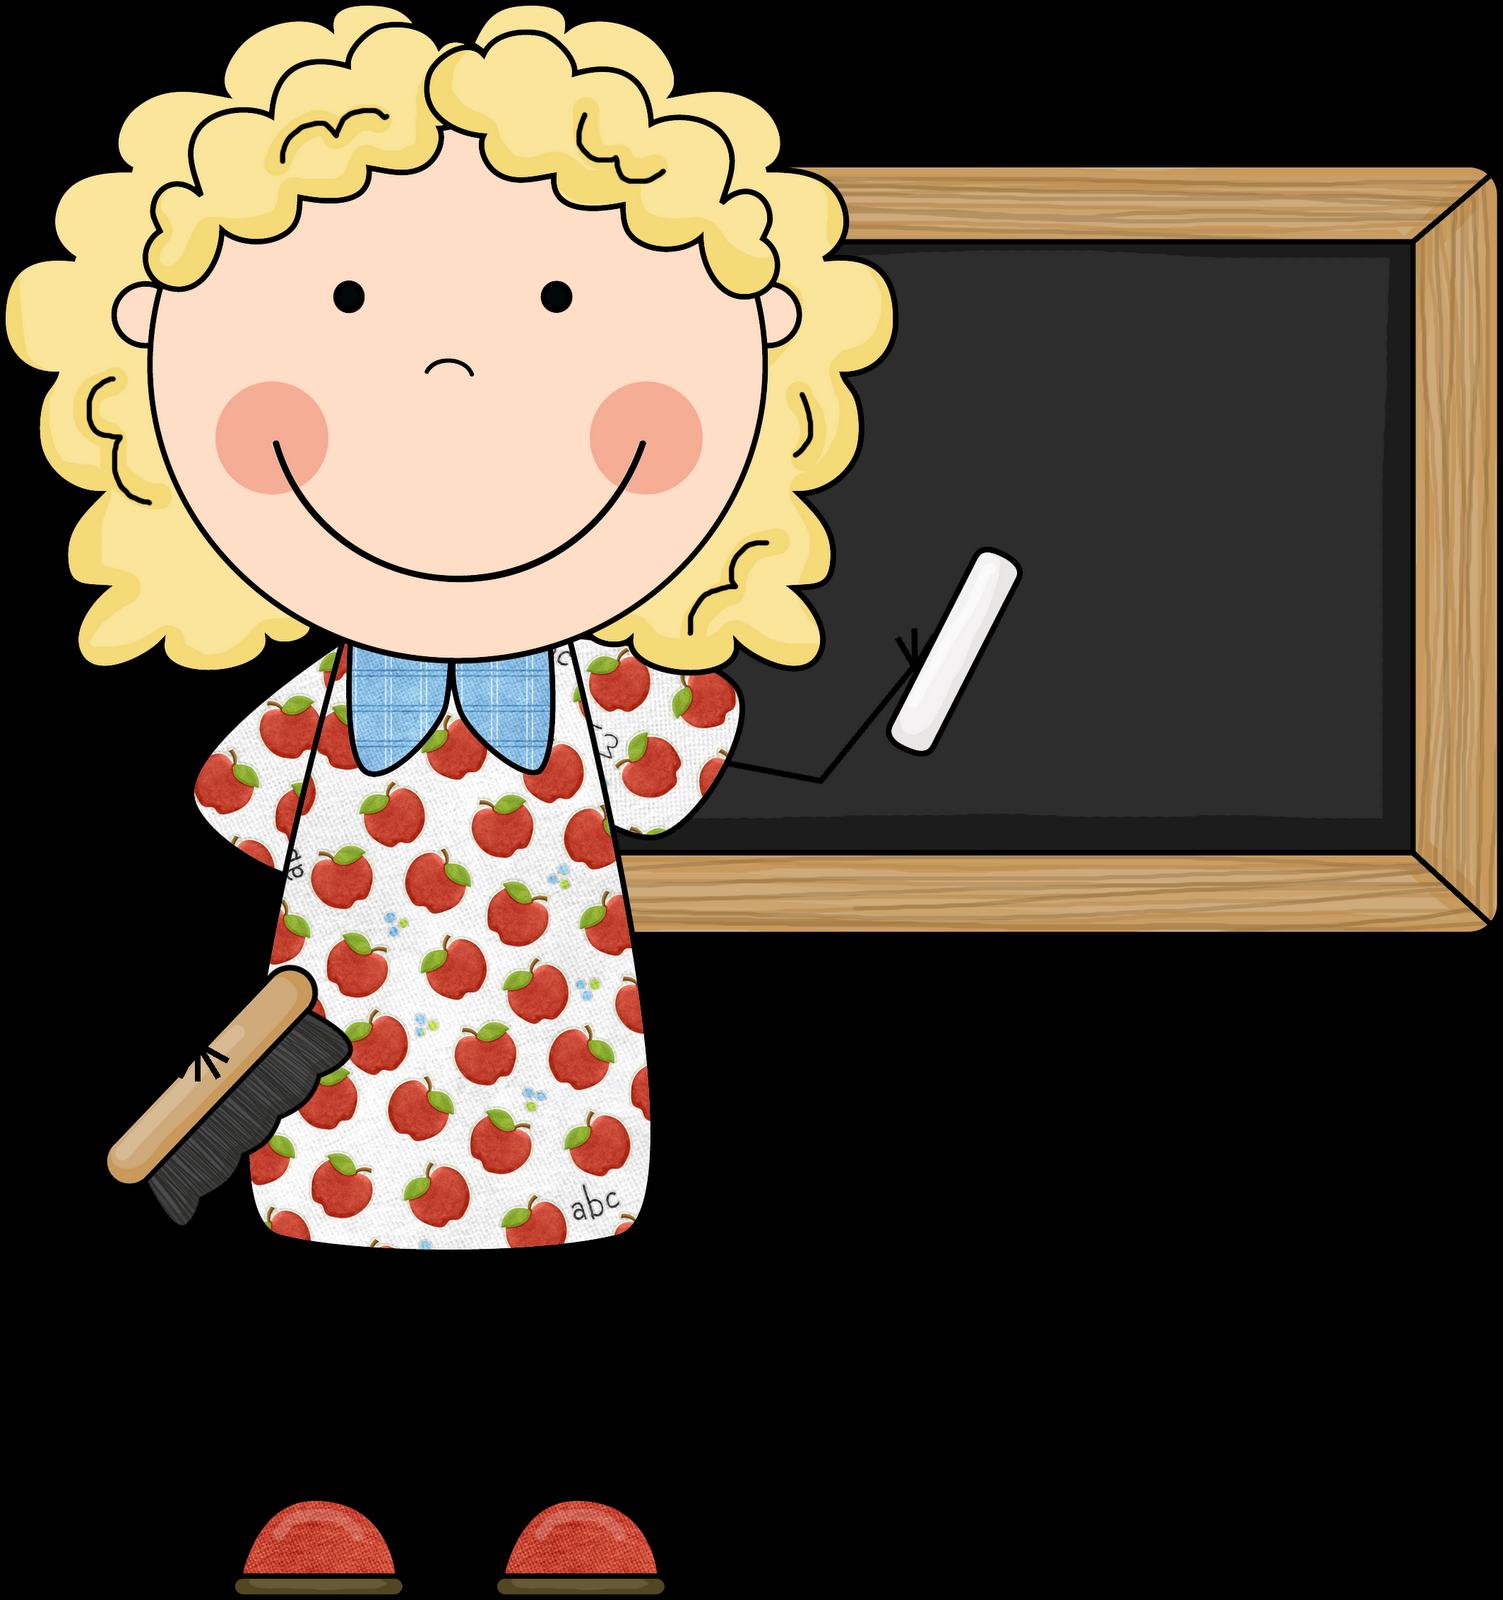 Clip Art. Teaching Clipart. Stonetire Free Clip Art Images